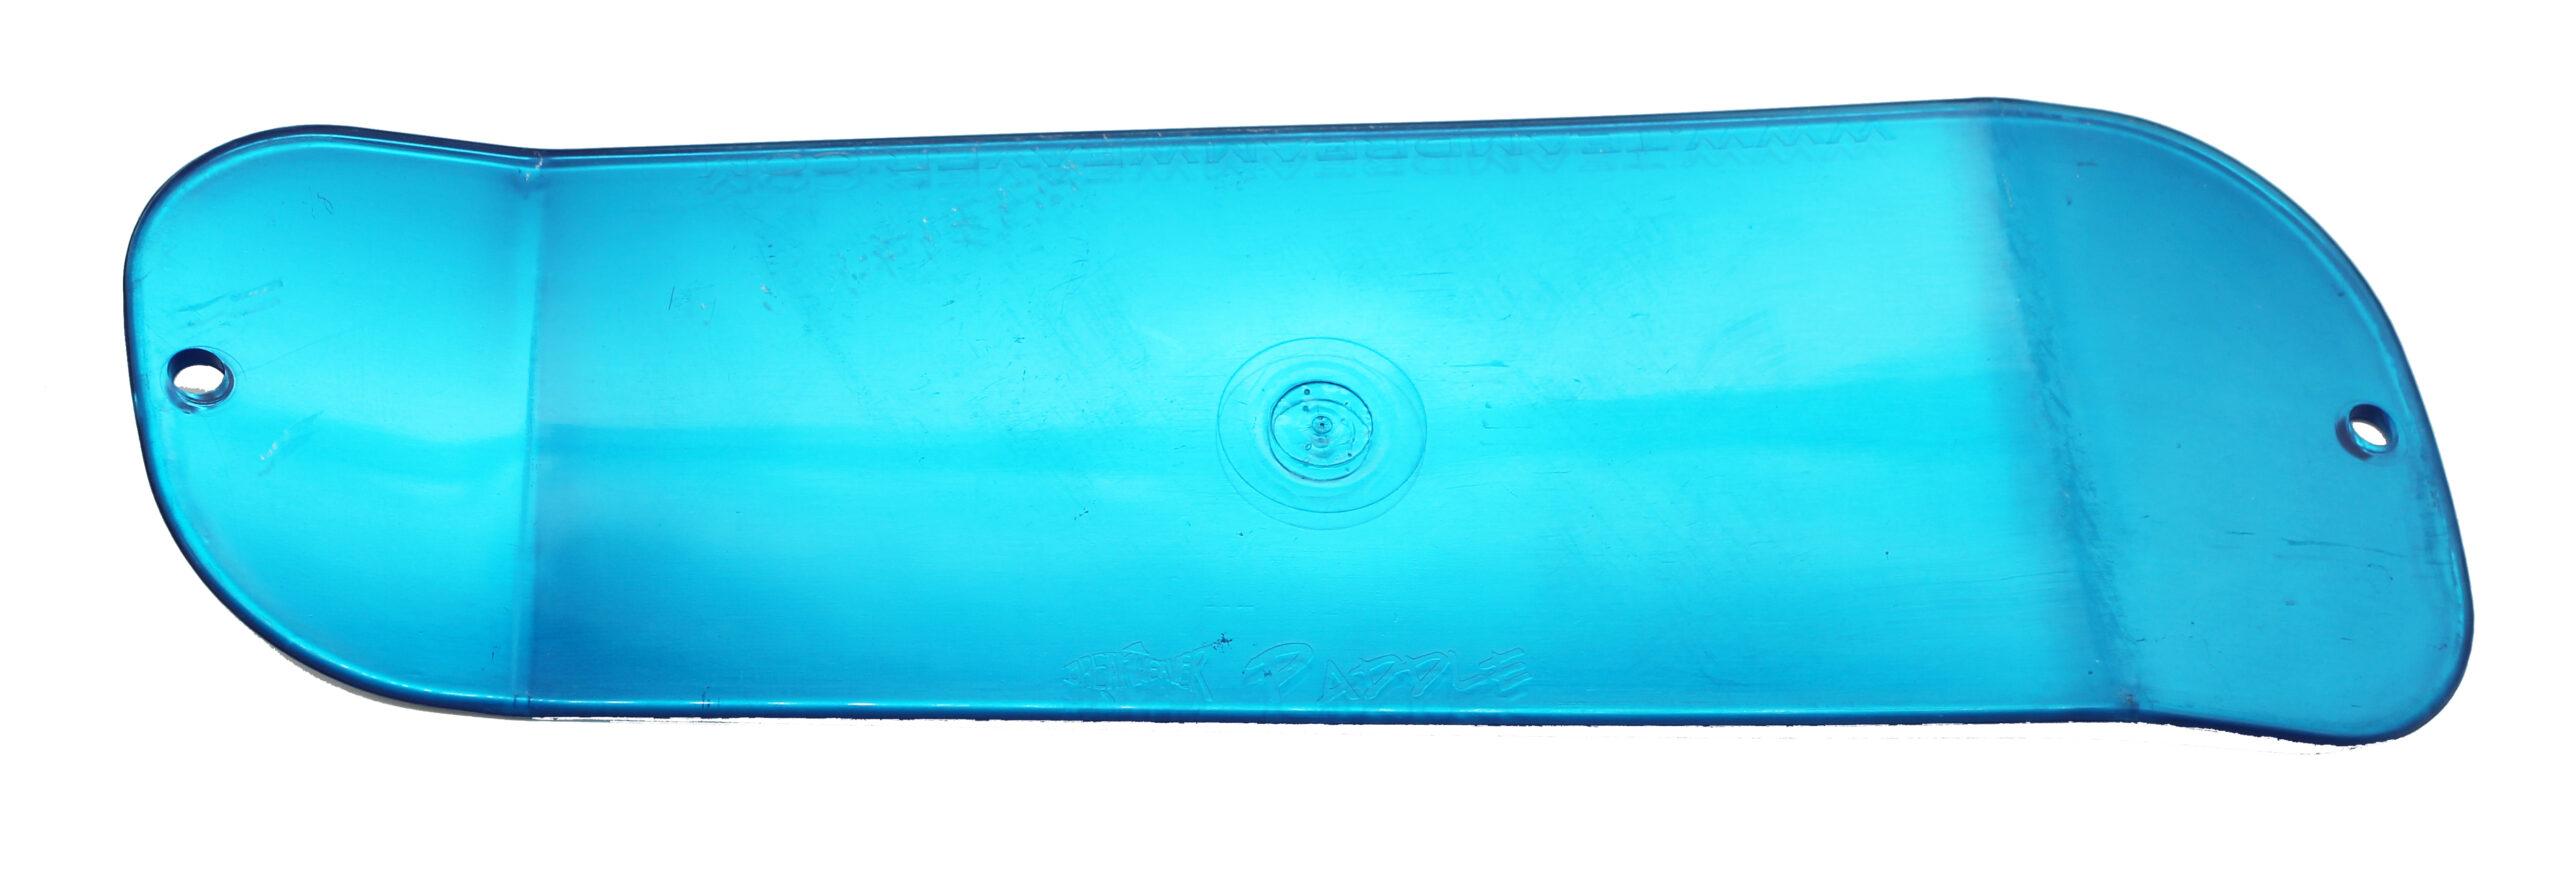 Paddle 11 – Blue/Chrome